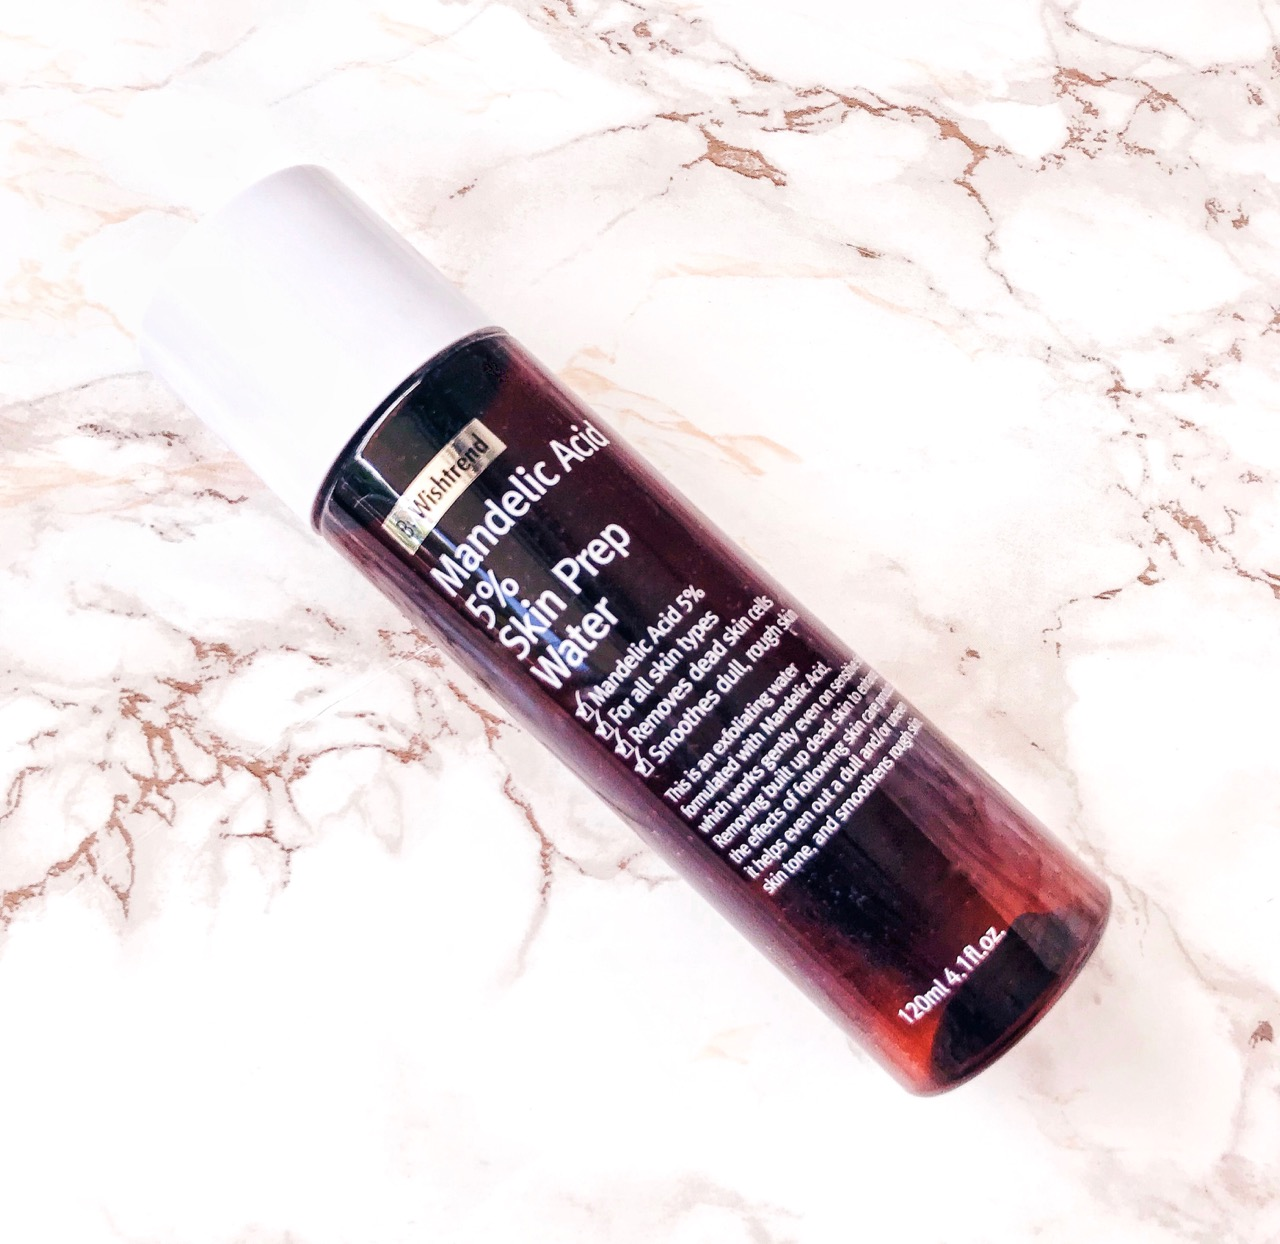 K-Beauty Empties Juni 2018 By Wishtrend Mandelic Acid 5% Skin Prep Water